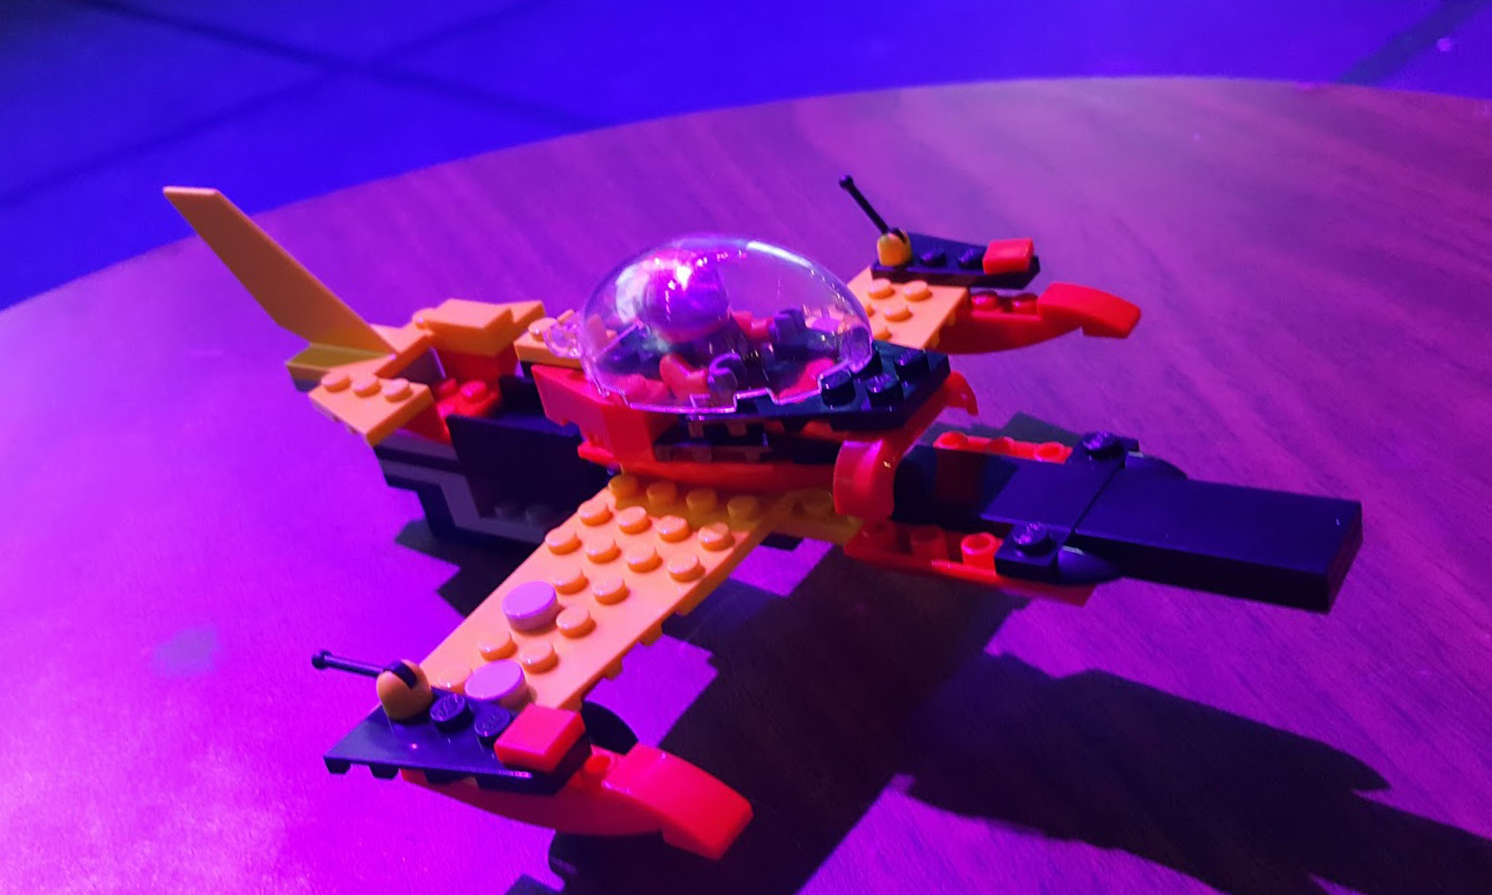 lego race plane freeform